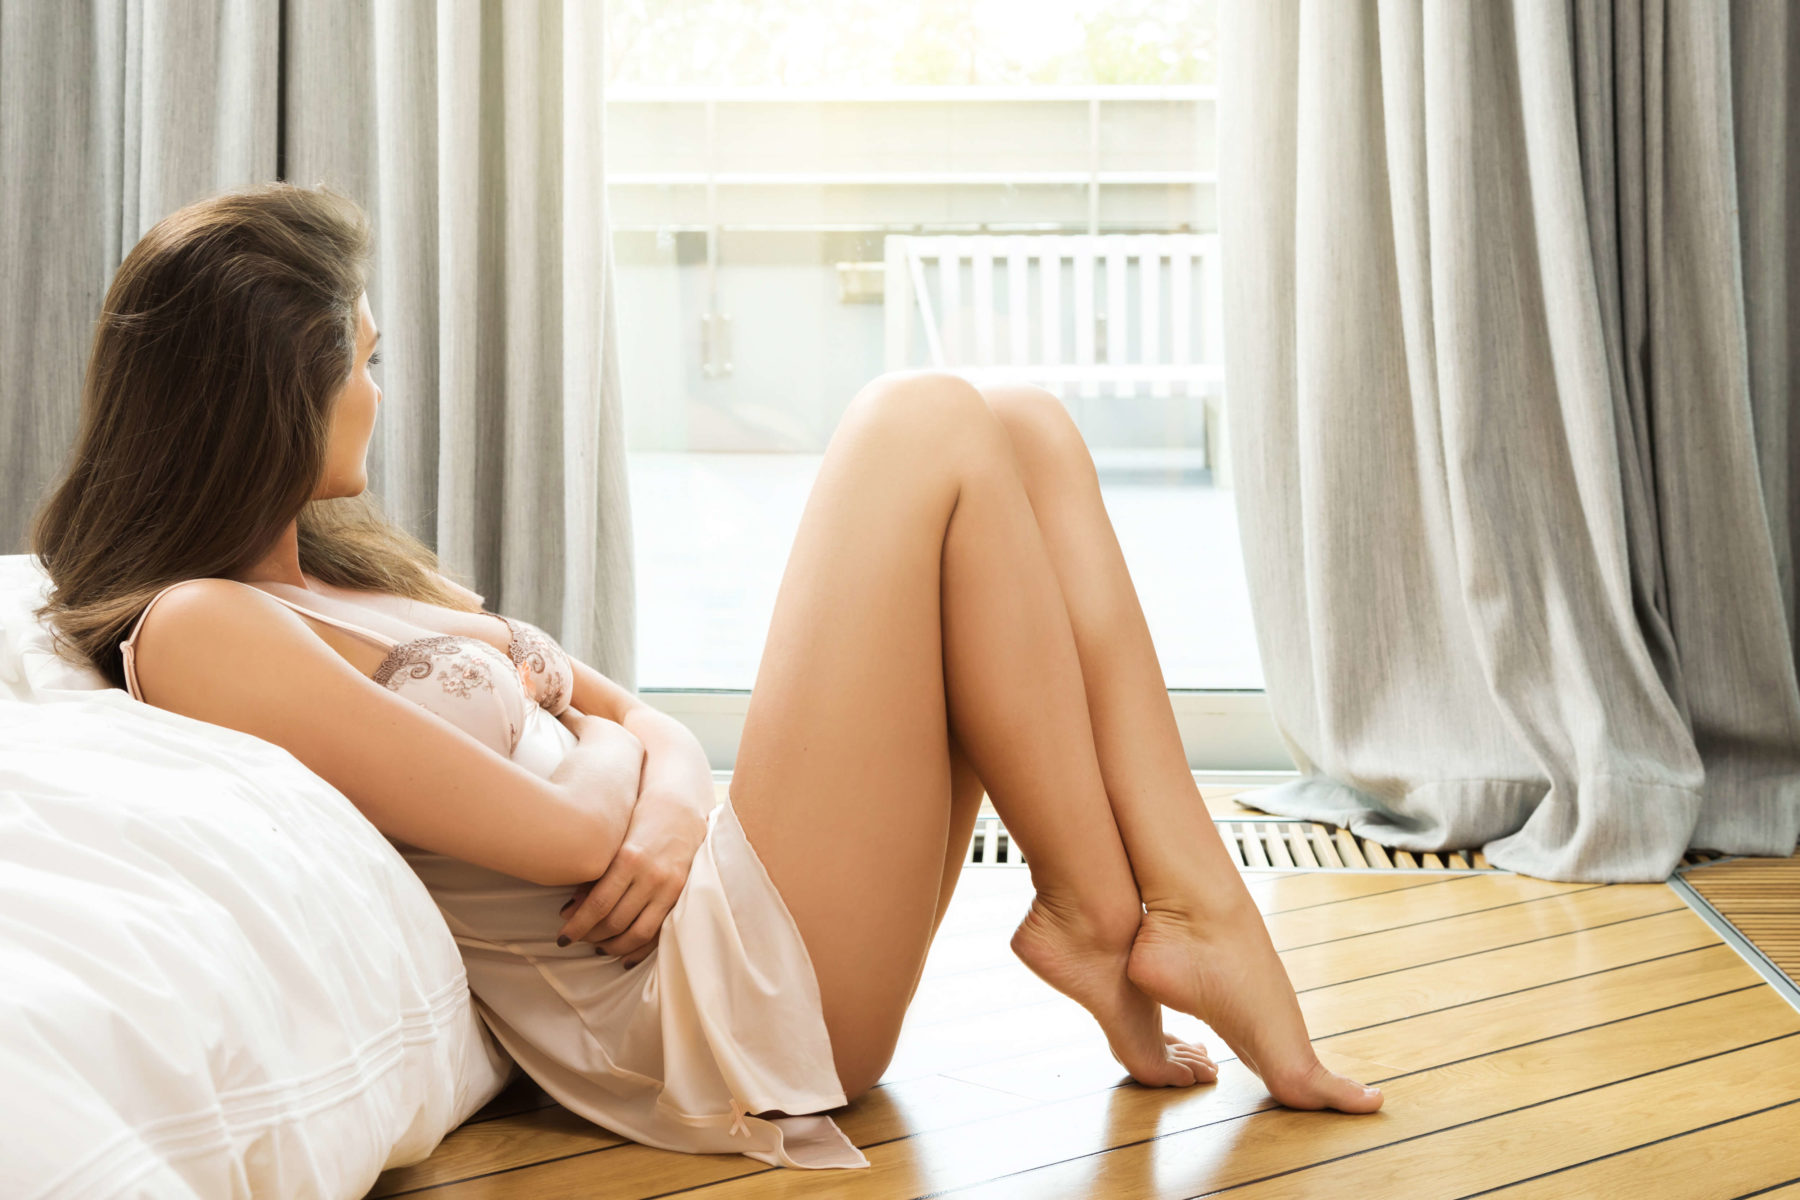 My Teenager Daughter is Sleeping with Older Men